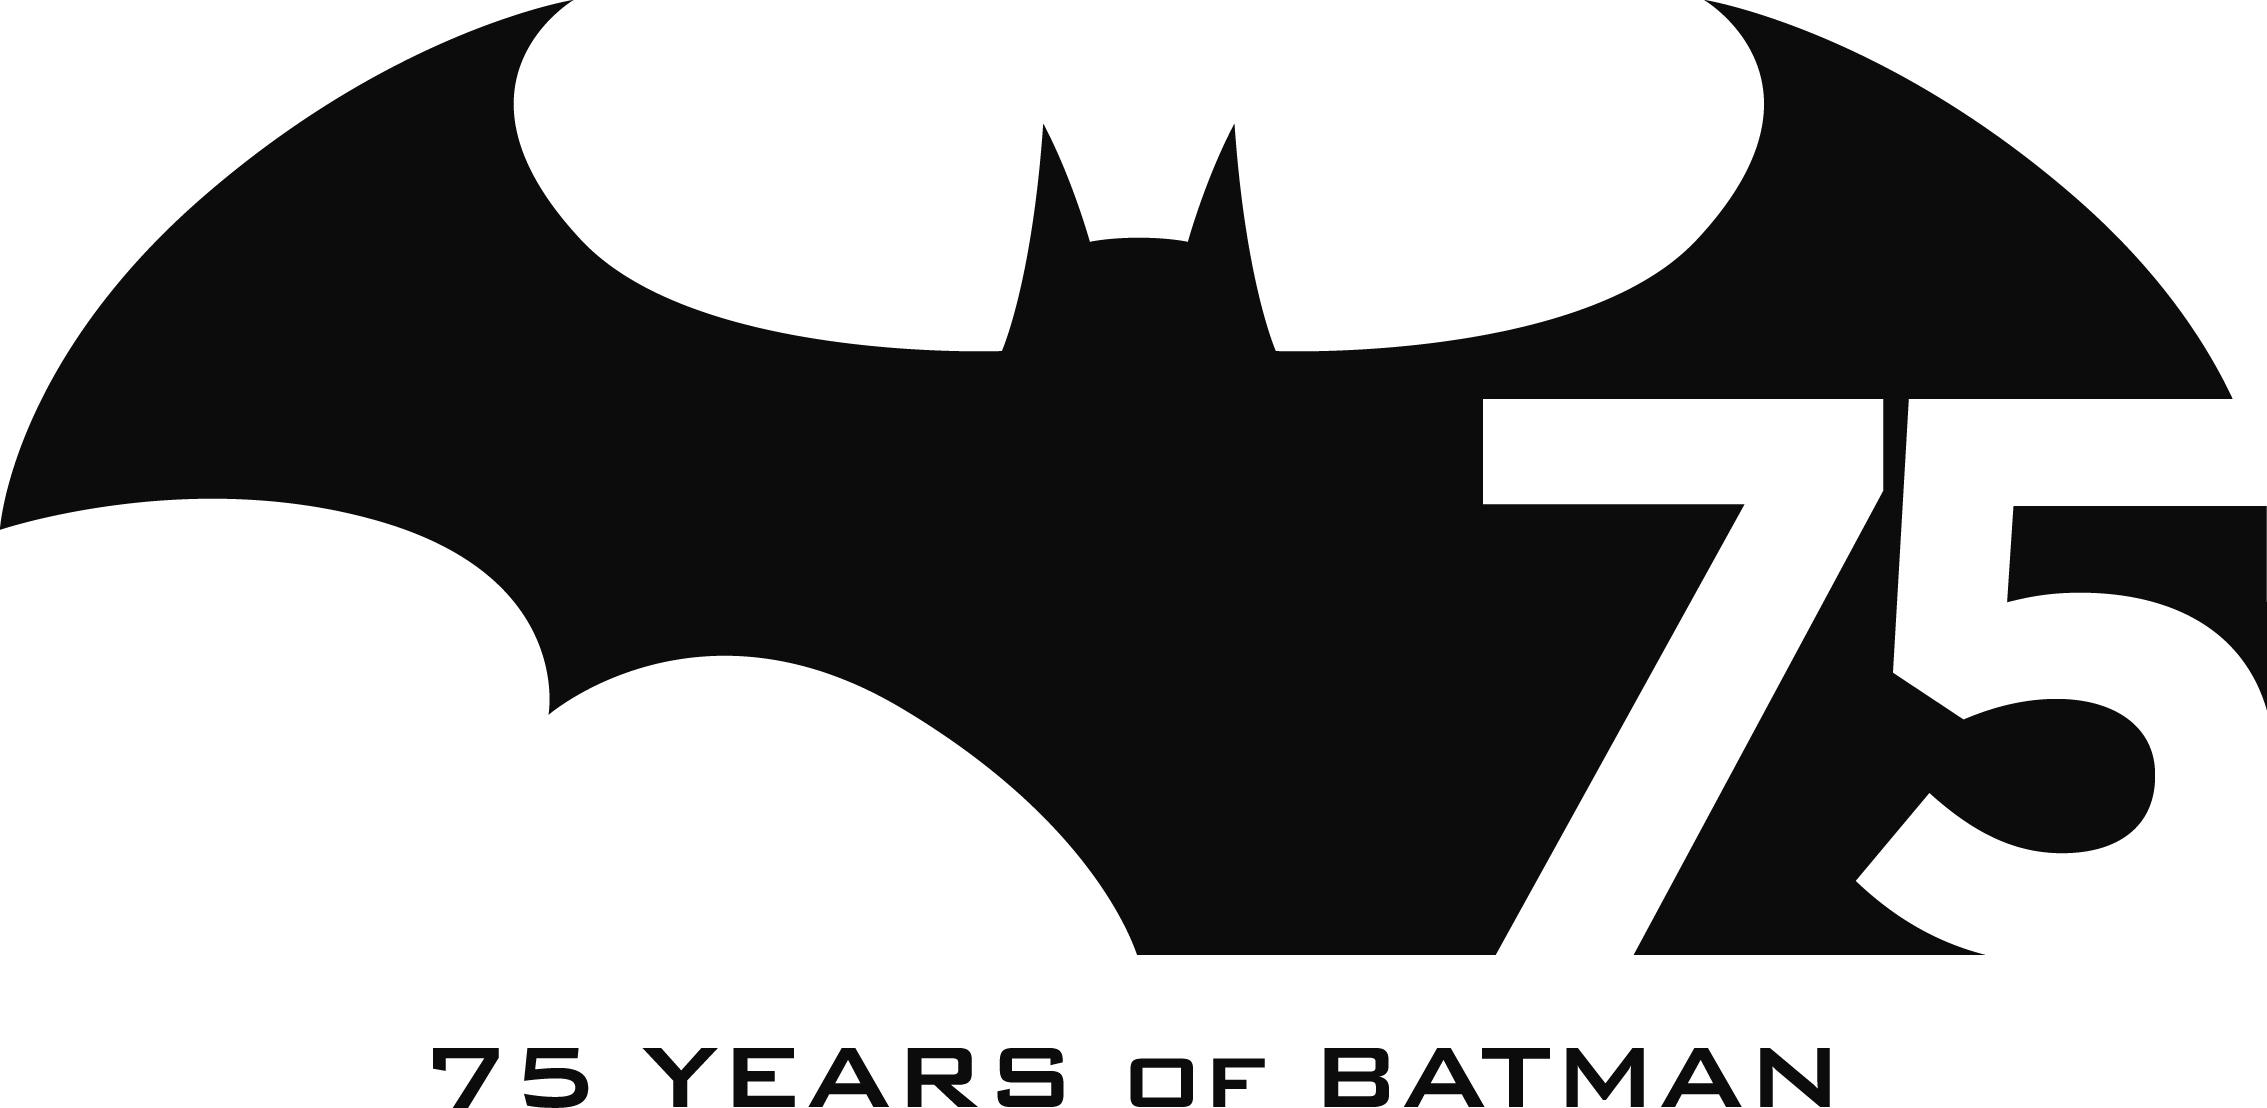 "<span class=""caps"">DC</span>, Warner Bros. Unveil Batman's 75th Anniversary Plans"